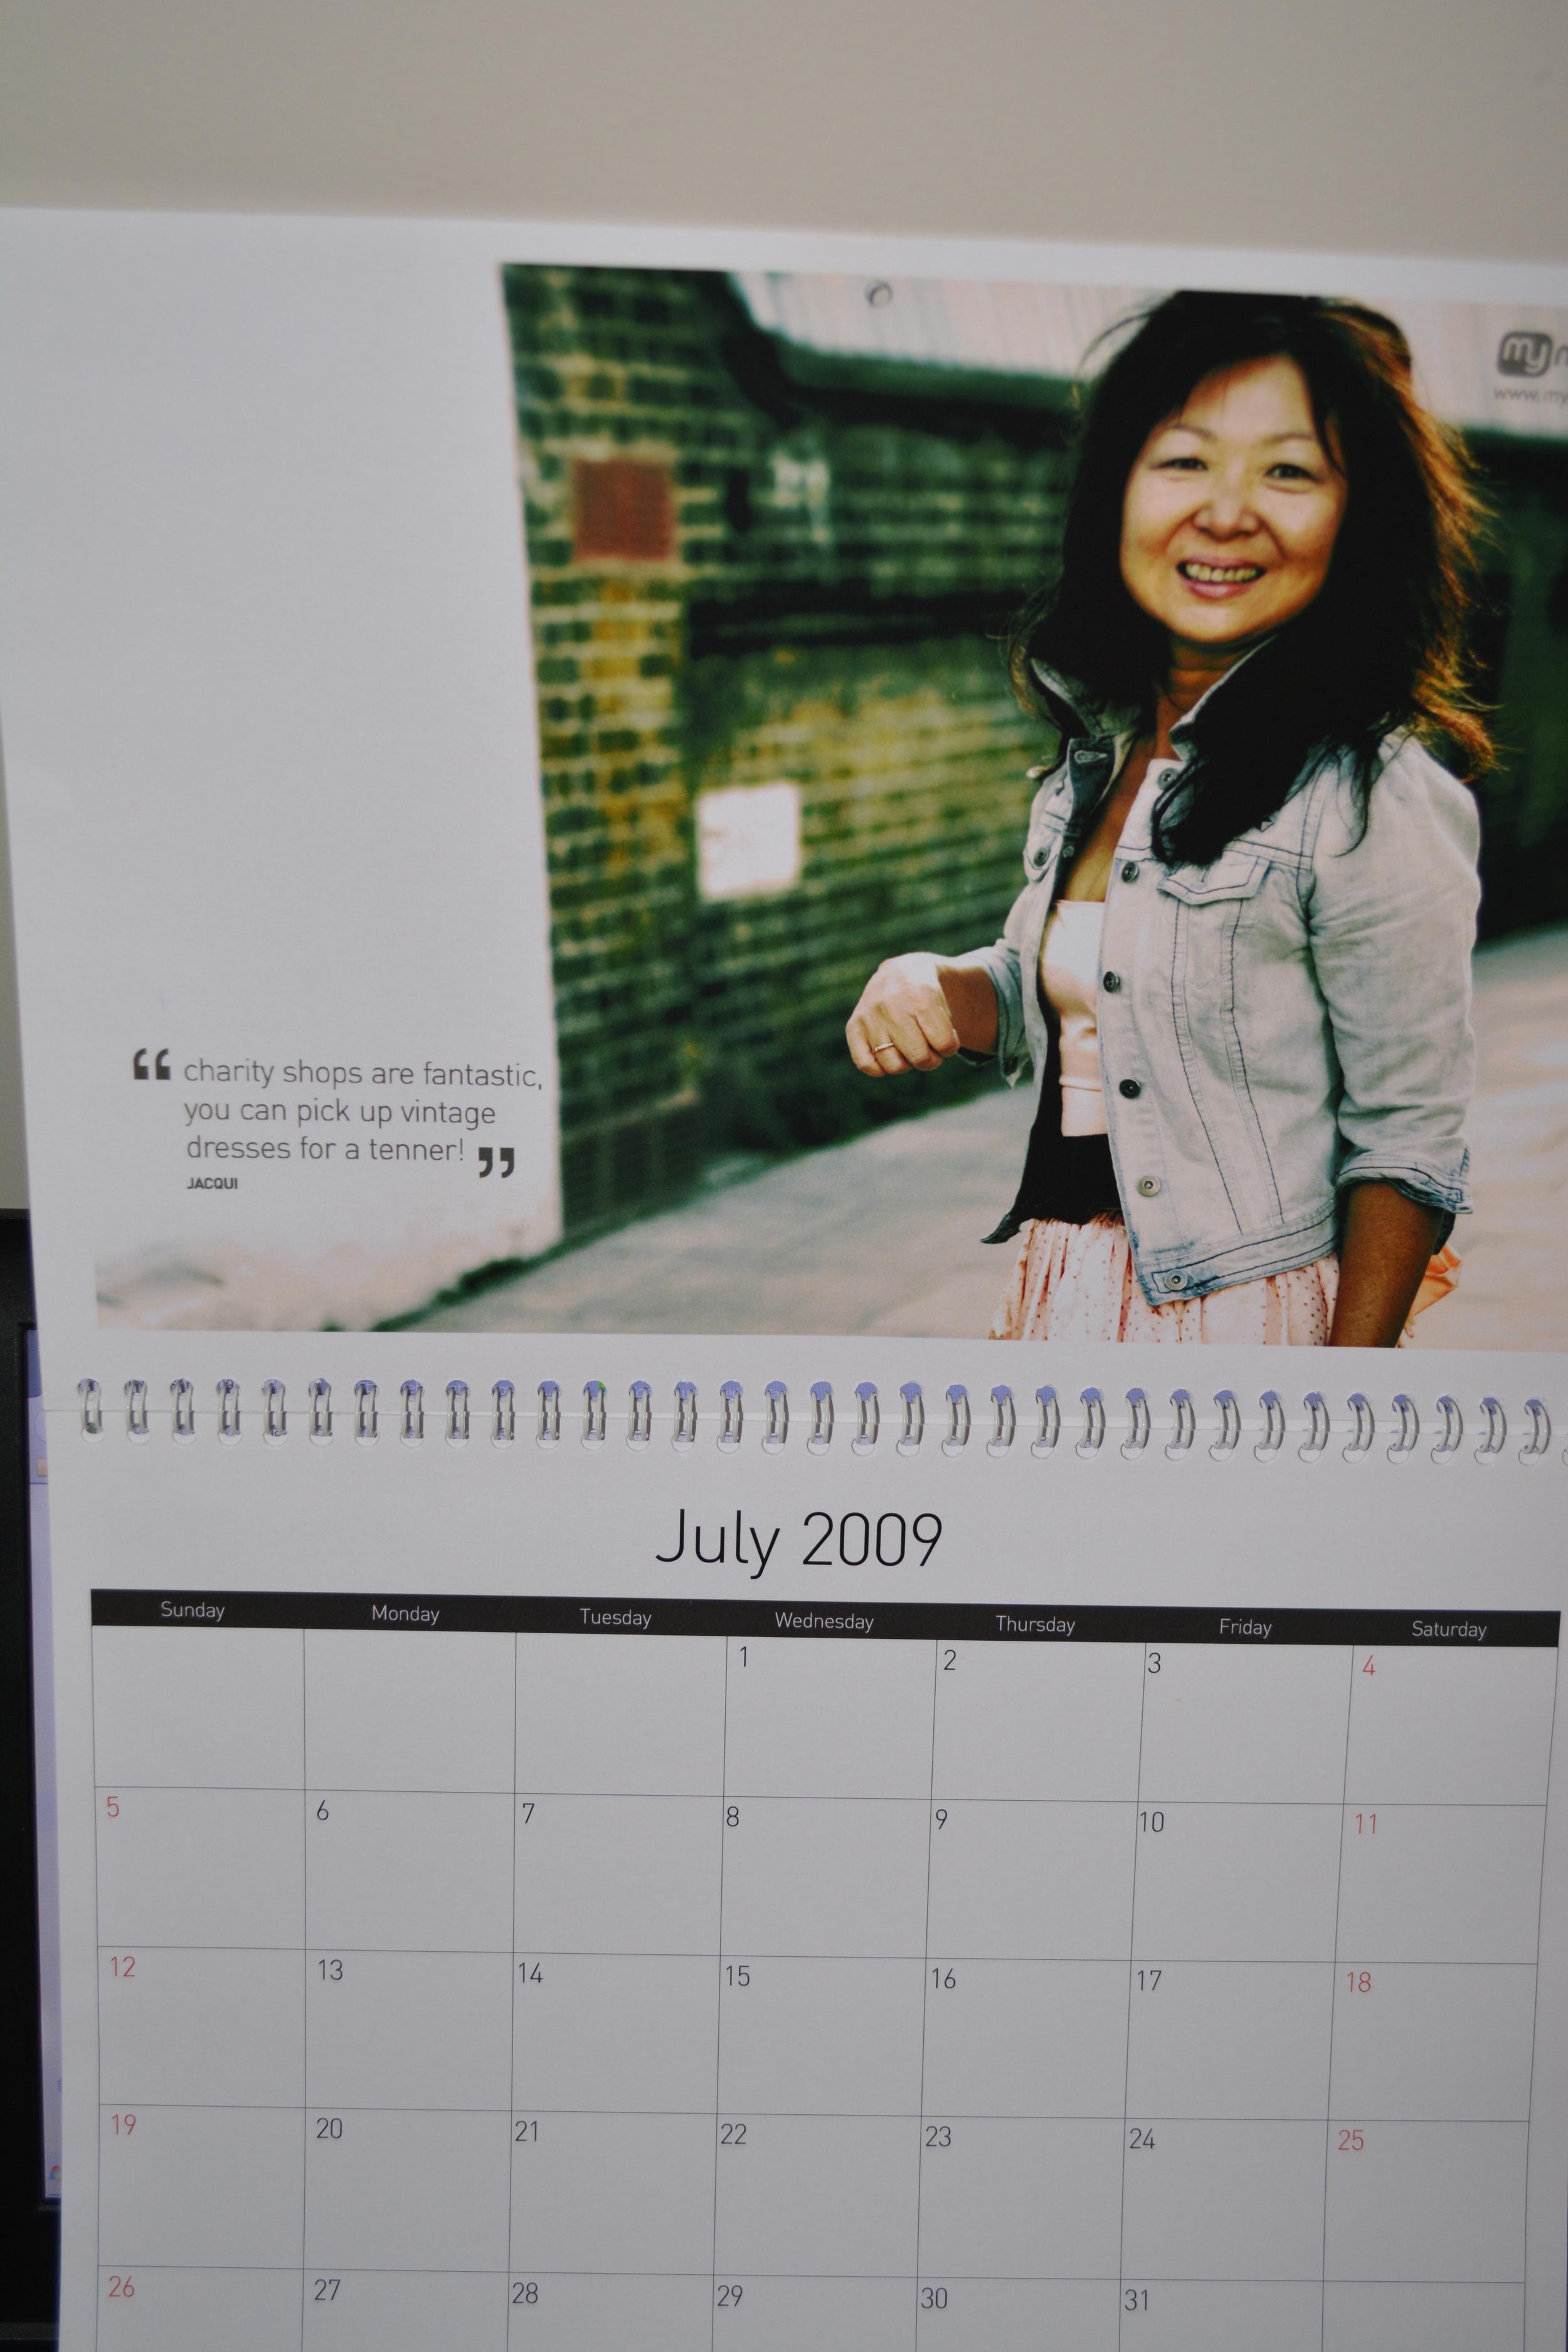 Mrs July 2009